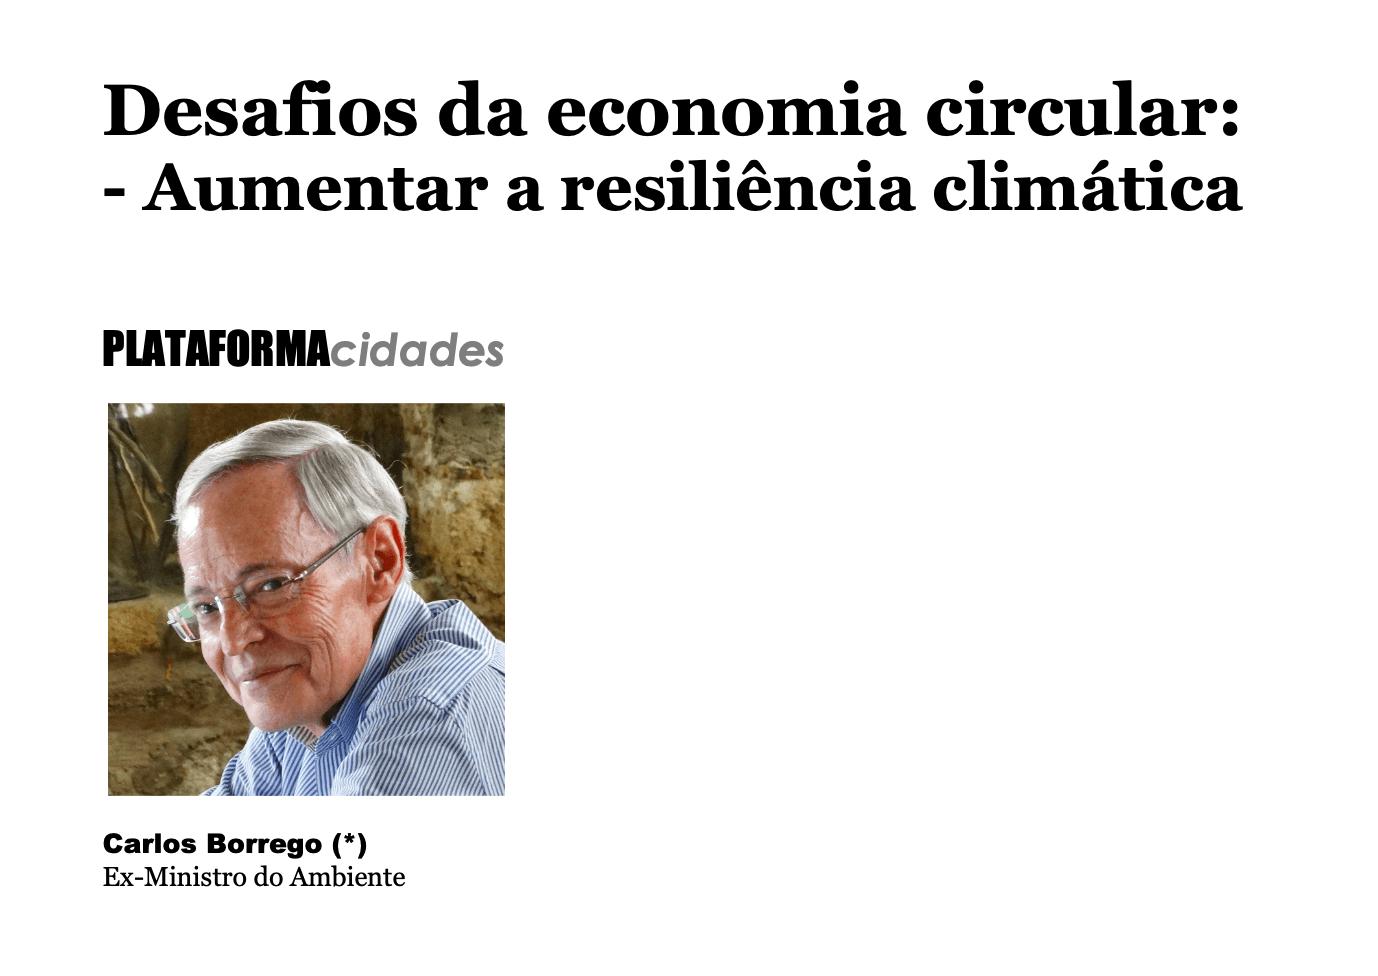 Desafios da economia circular: Aumentar a resiliência climática